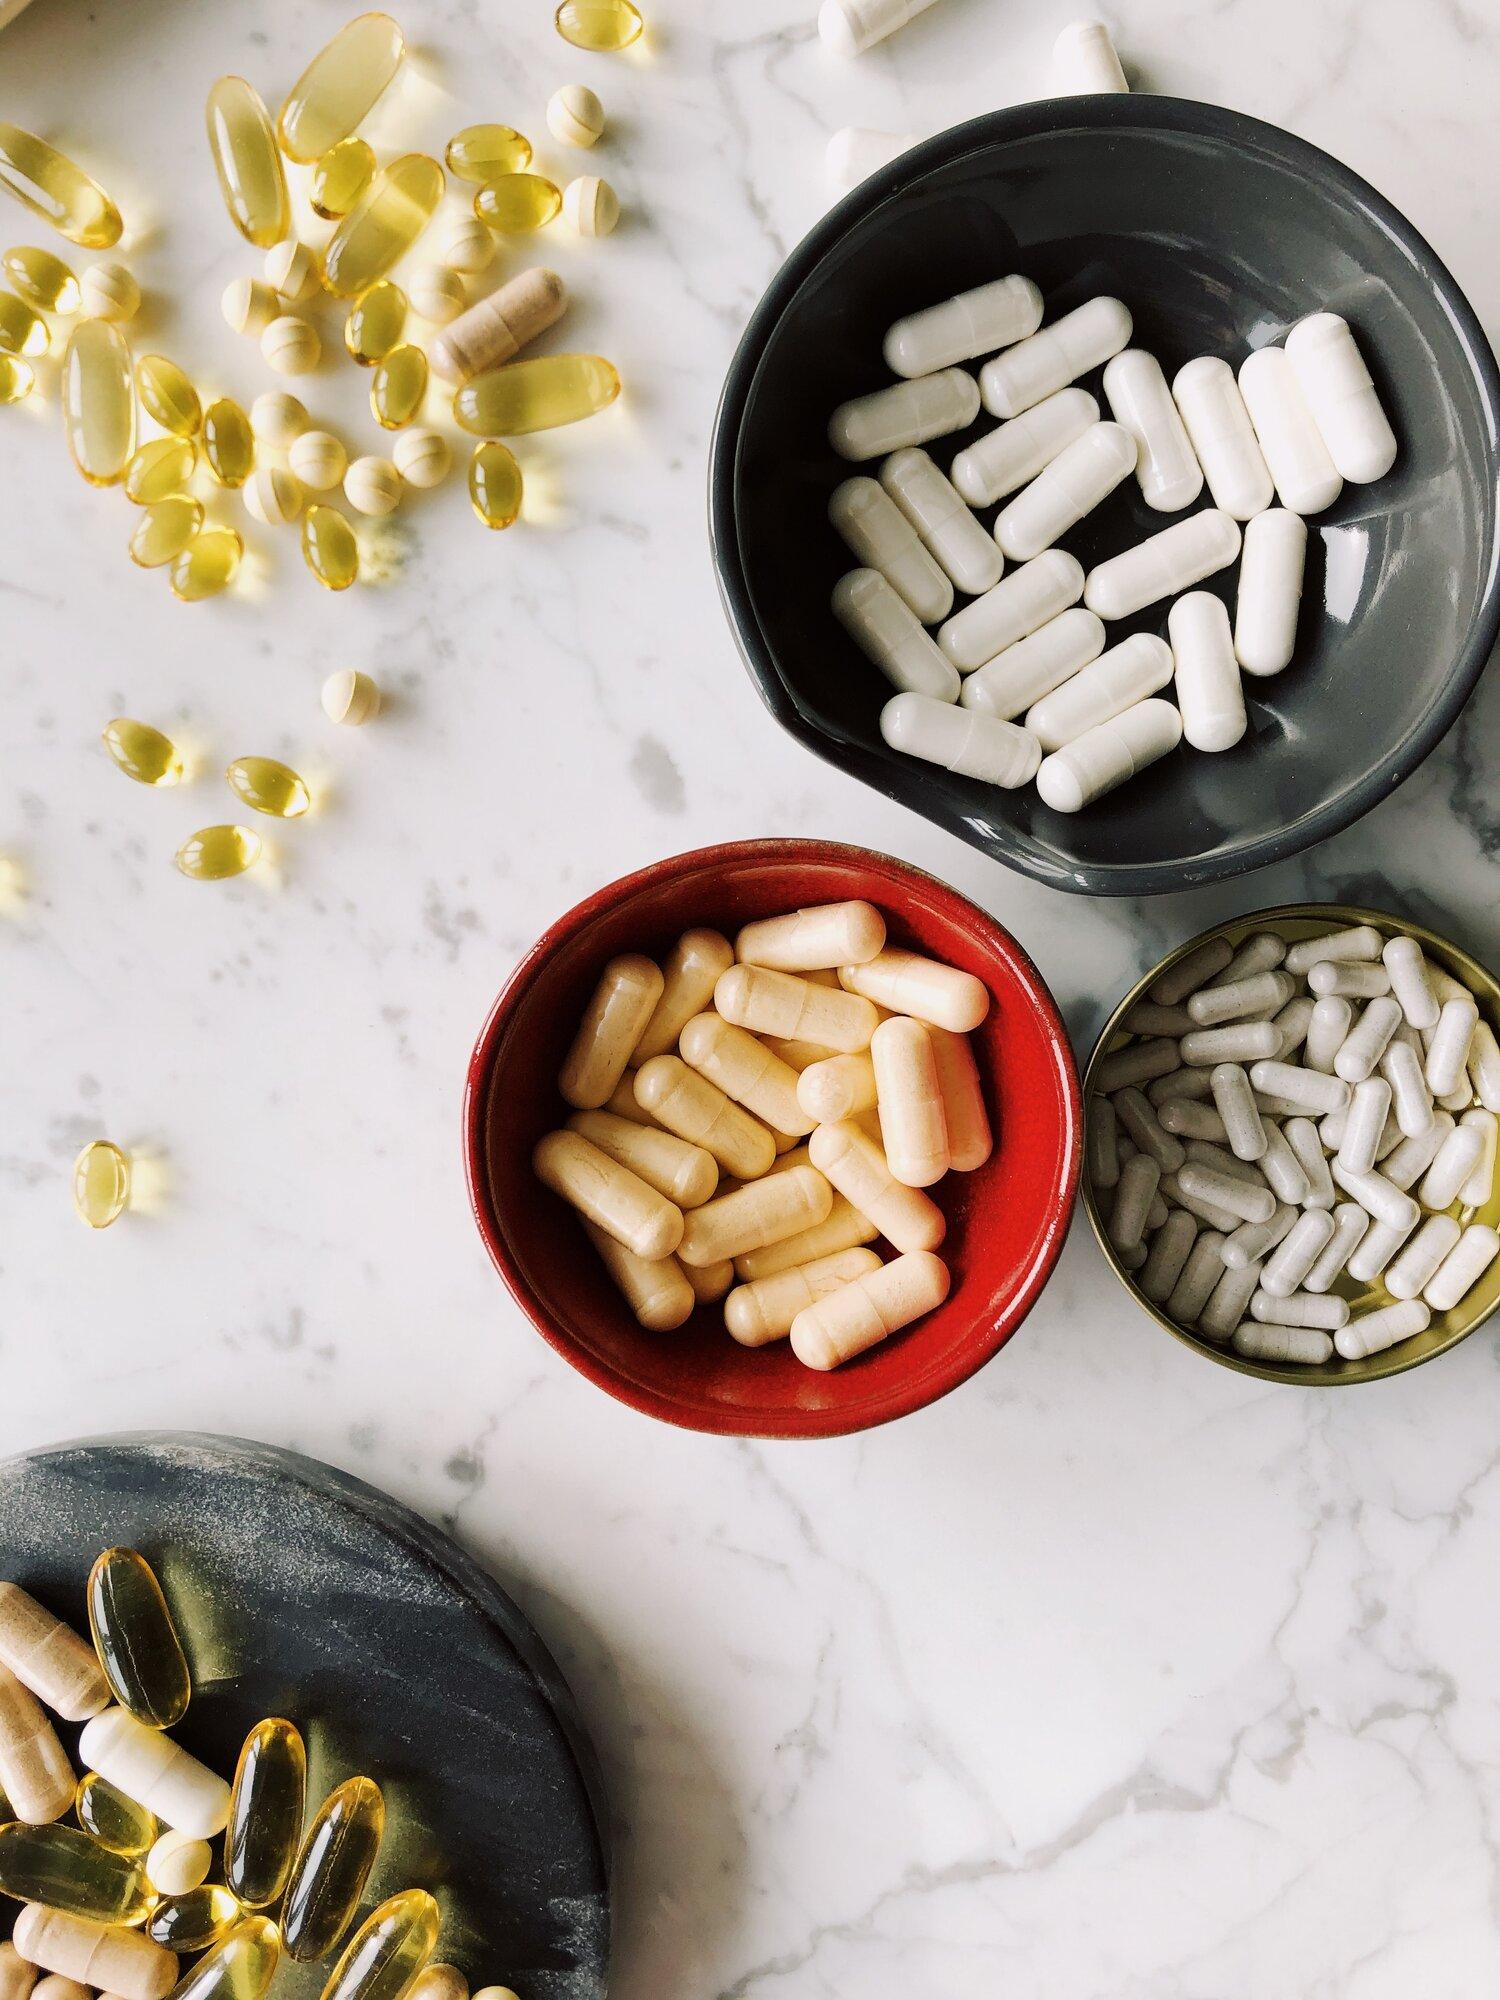 Supliment dietetic detox, Ce cred alţii: